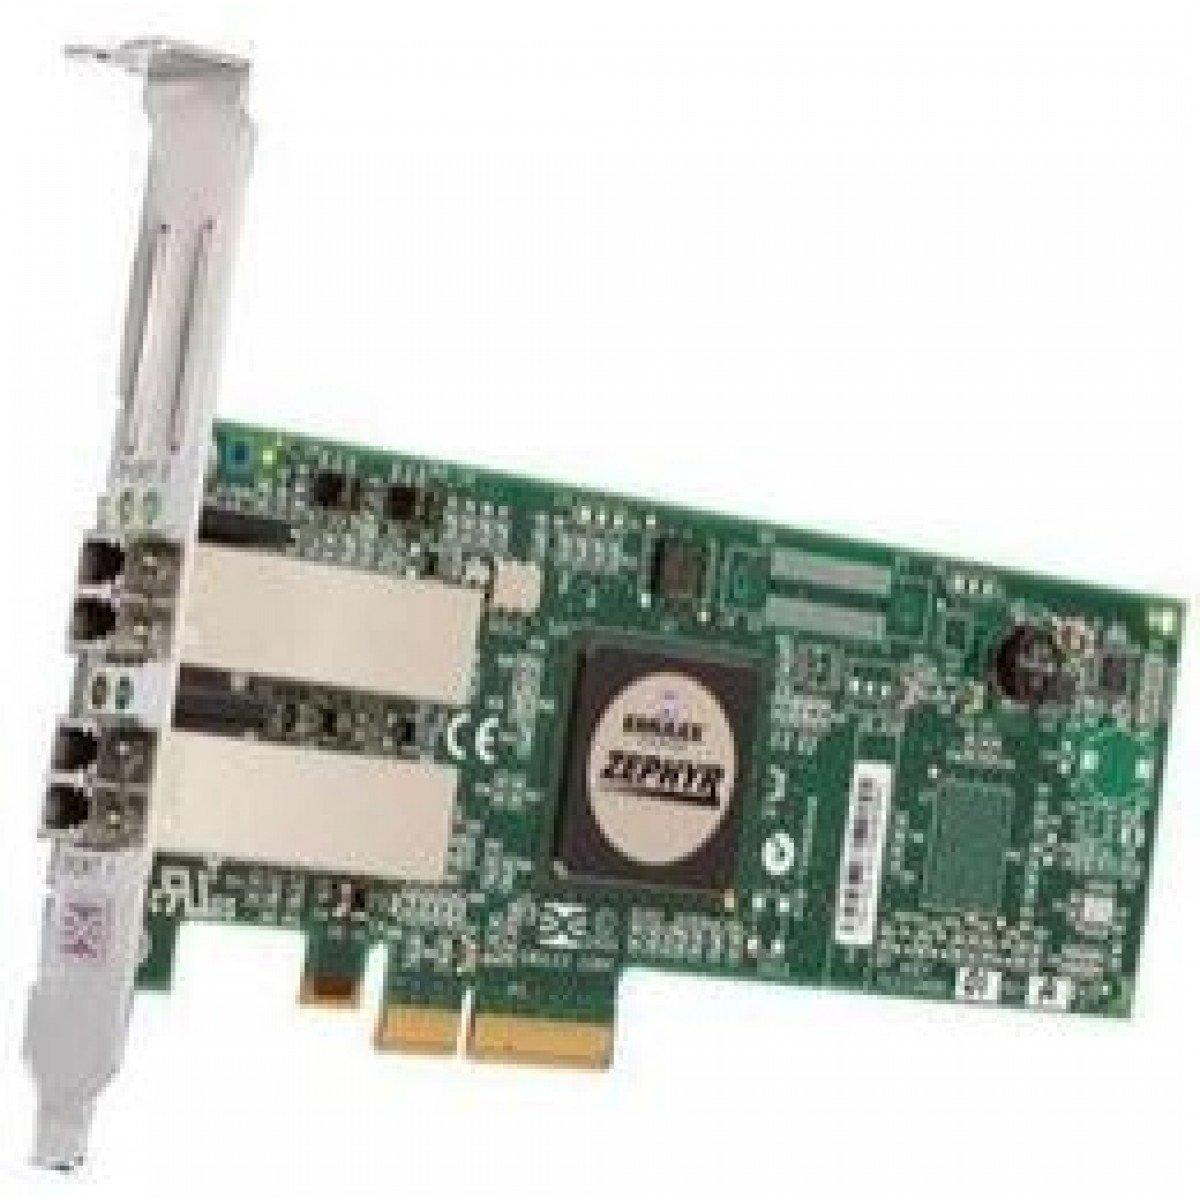 HP QLogic QLE2562-HP AJ764 8Gb Dual Port HBA Adapter 489191-001 W/SFP LP